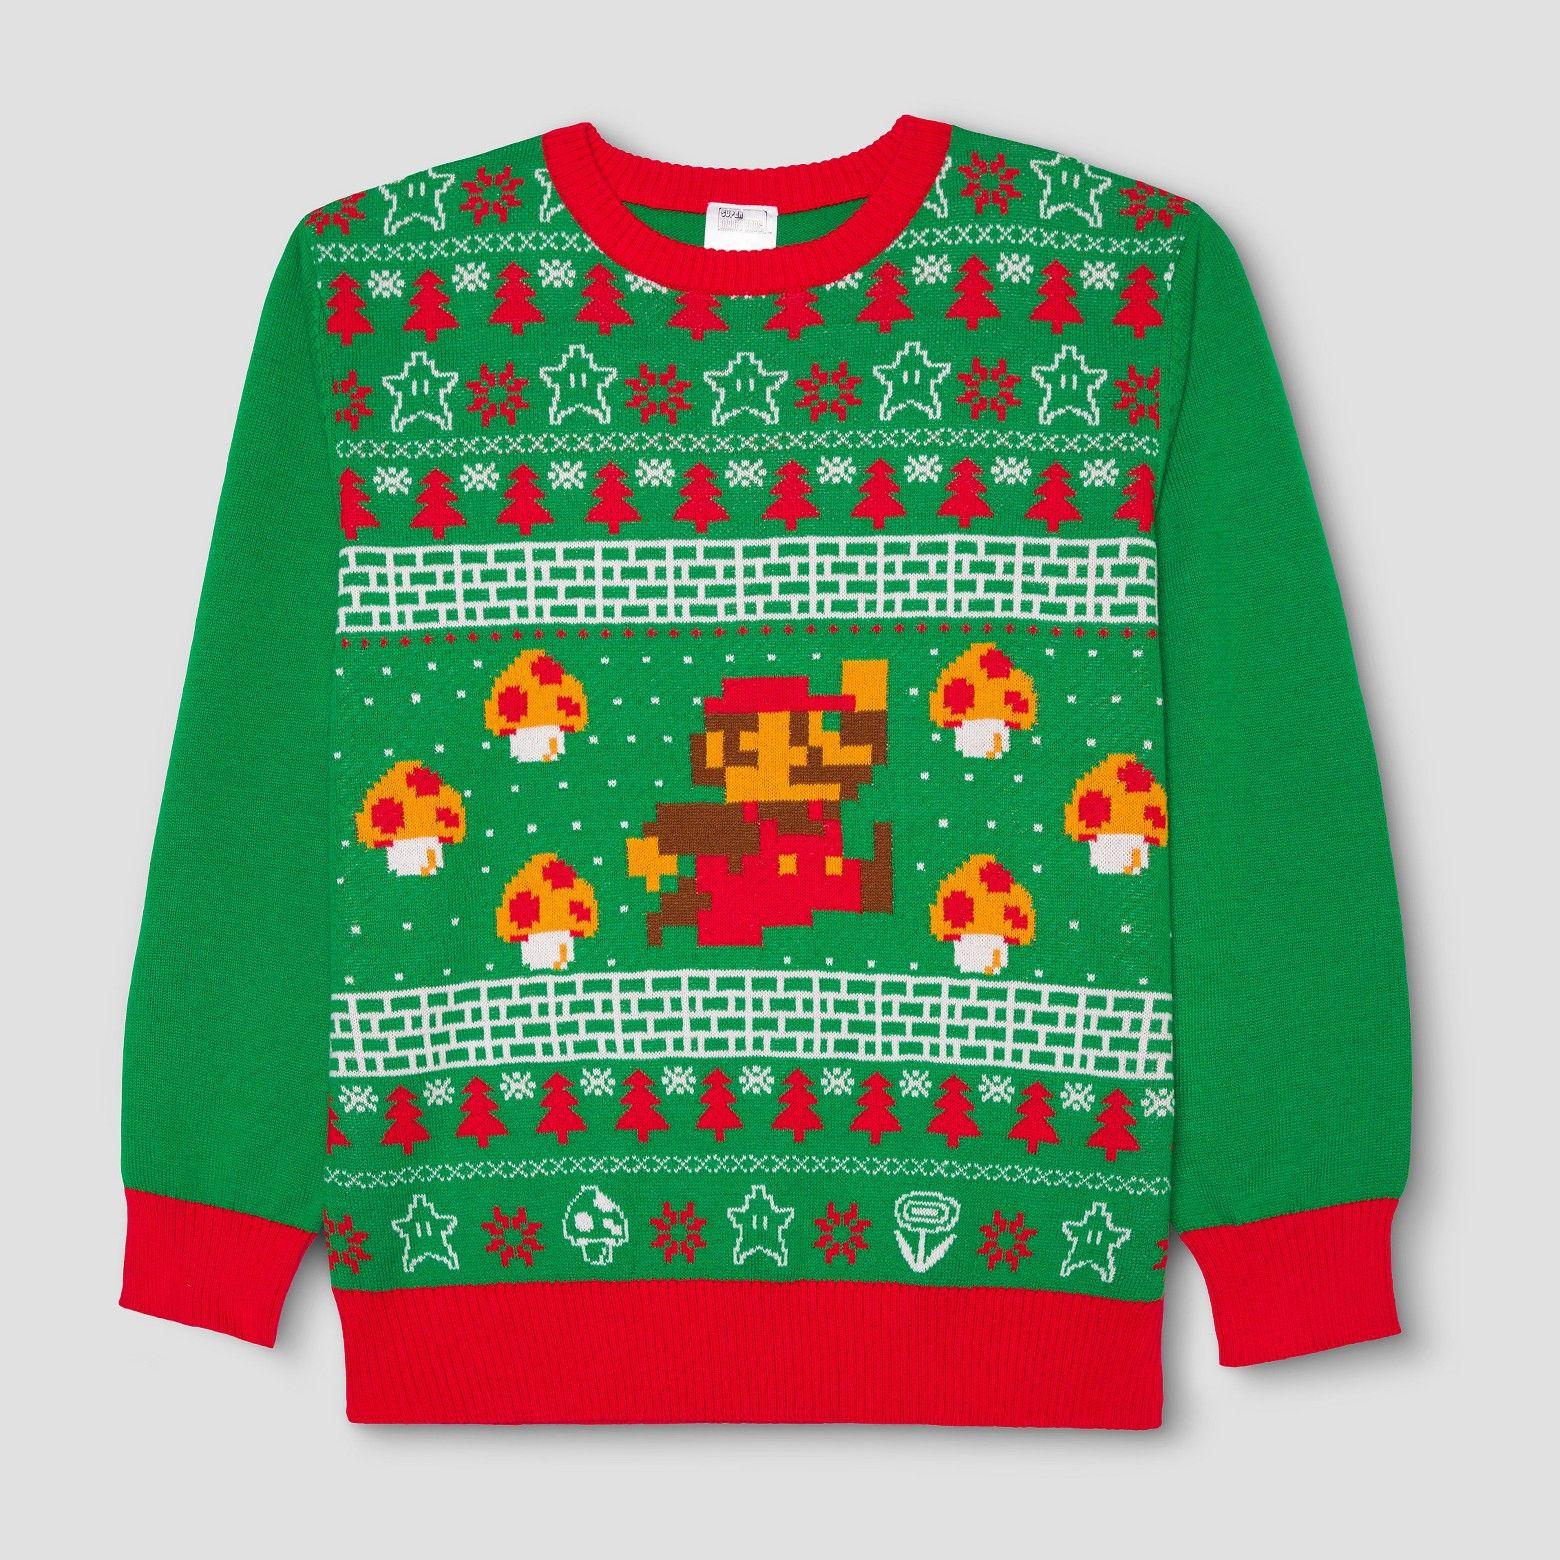 Princess Peach Ugly Christmas Hoodie Sweater Unisex Mens /& Women/'s Clothing Video Game Retro Classics Retro Hoodie Christmas Gifts